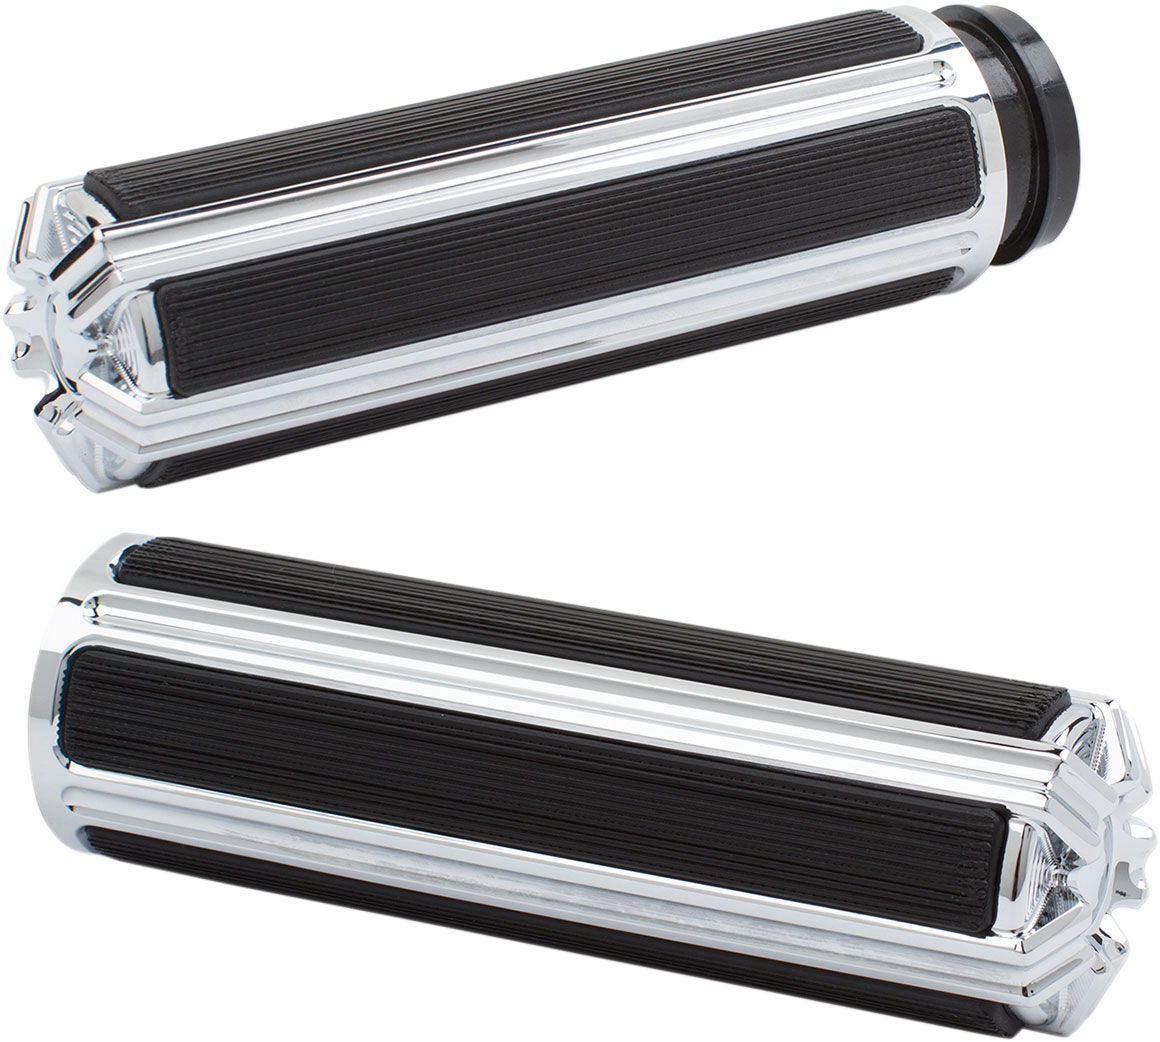 Arlen Ness - I-5000 - 10-Gauge Comfort Grips, Chrome